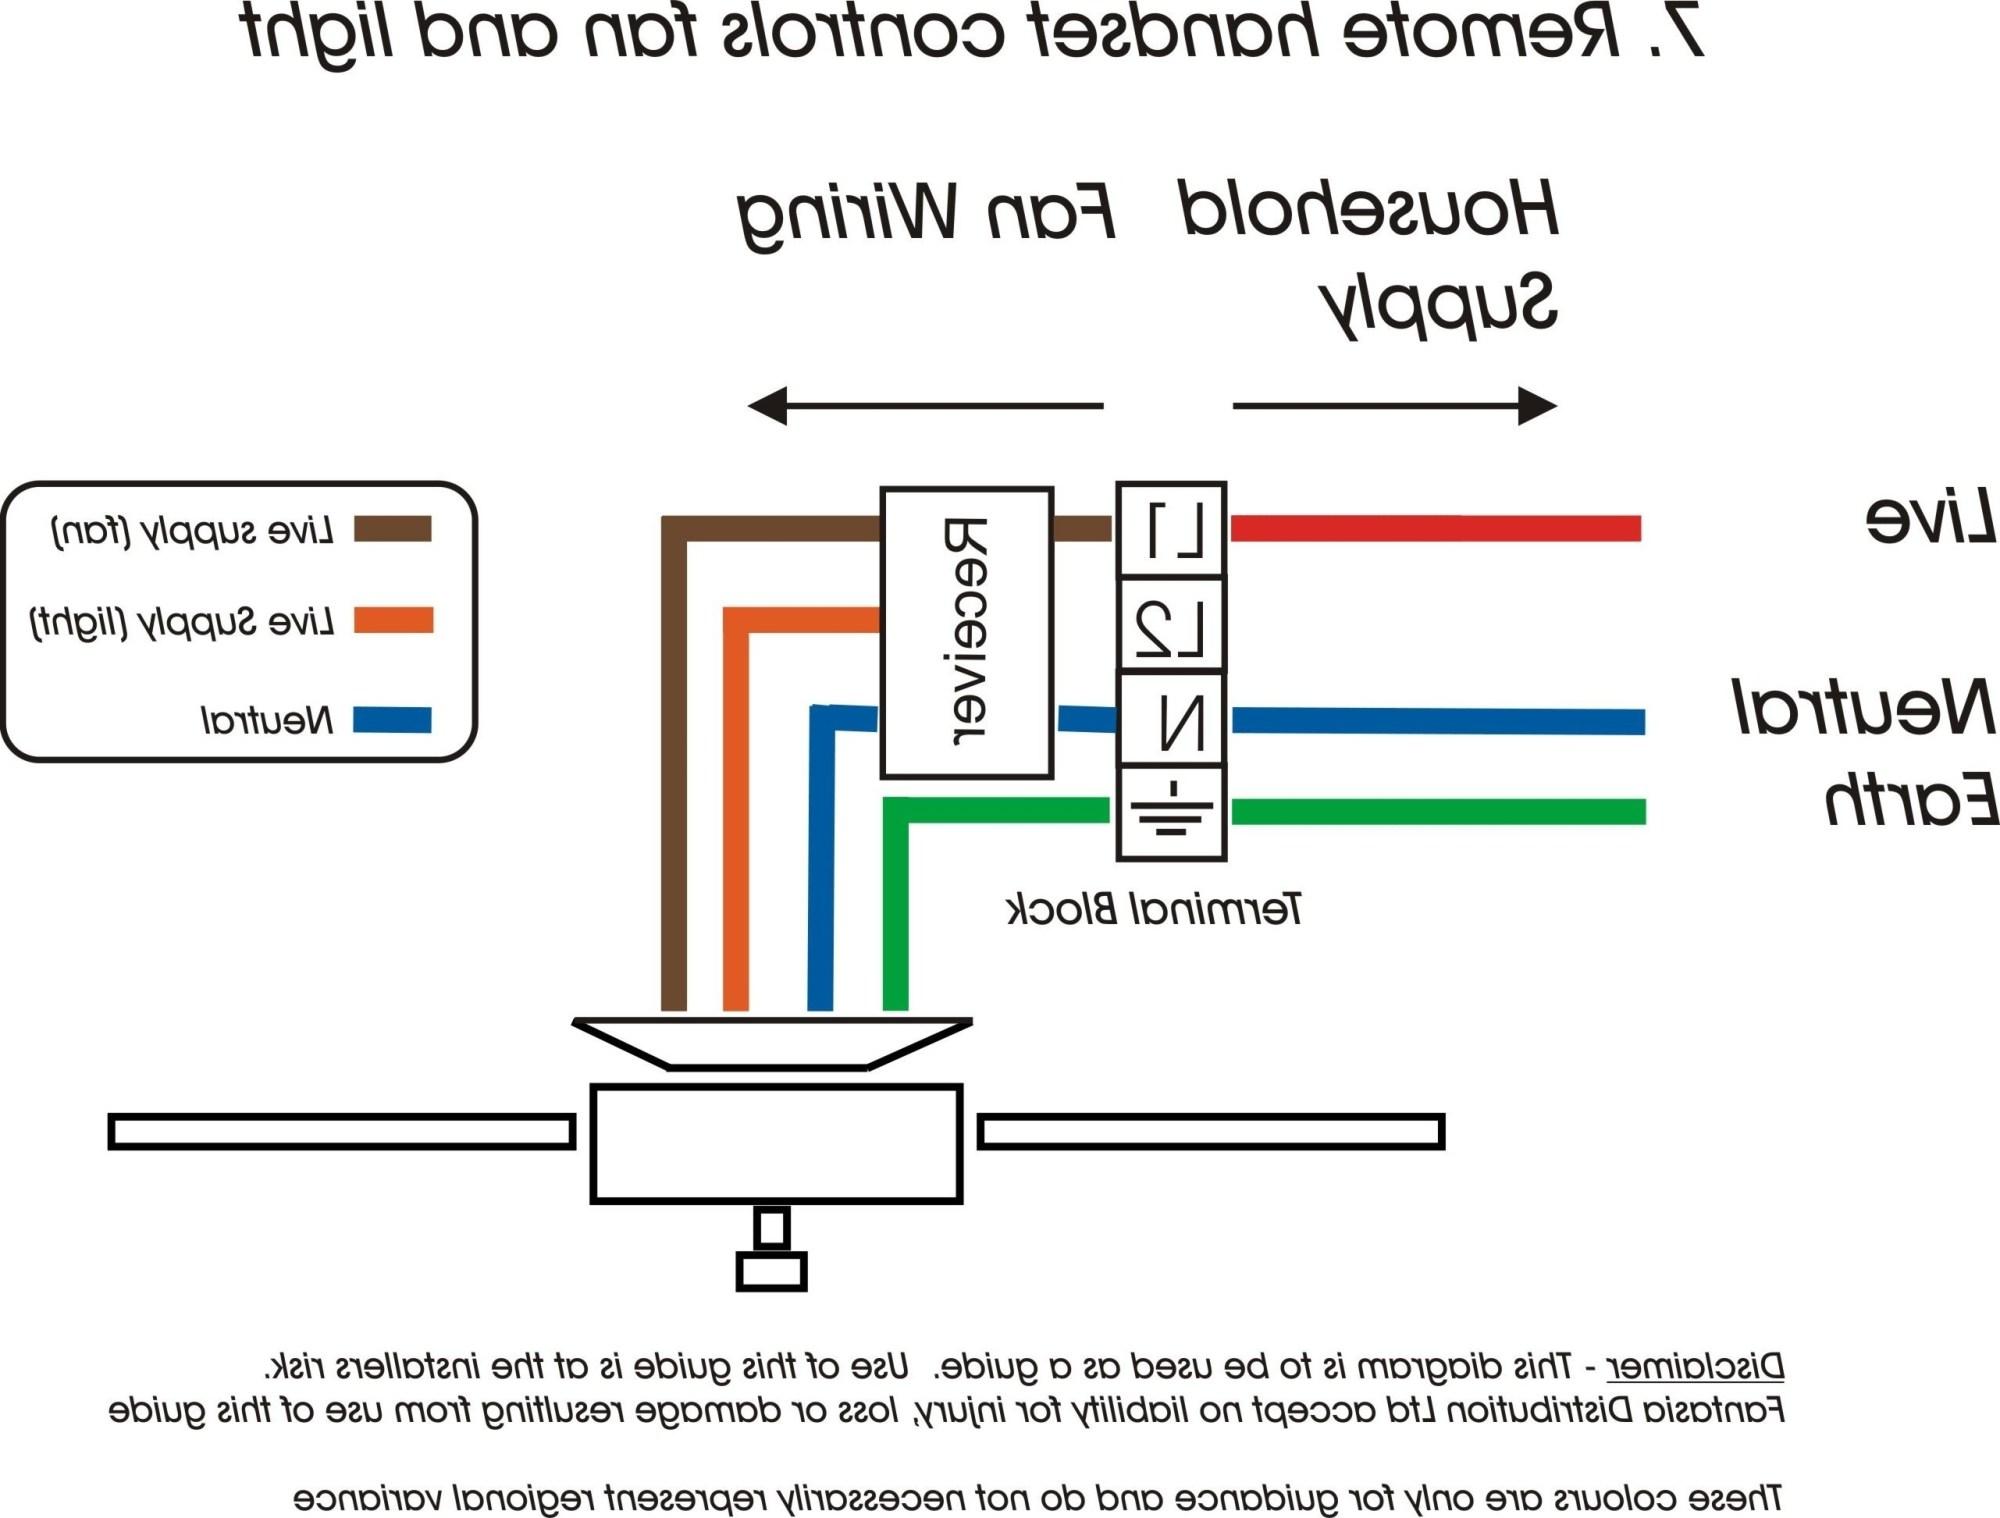 hight resolution of 1 lamp ballast diagram math diagram vital signs diagram sign led wiring diagram